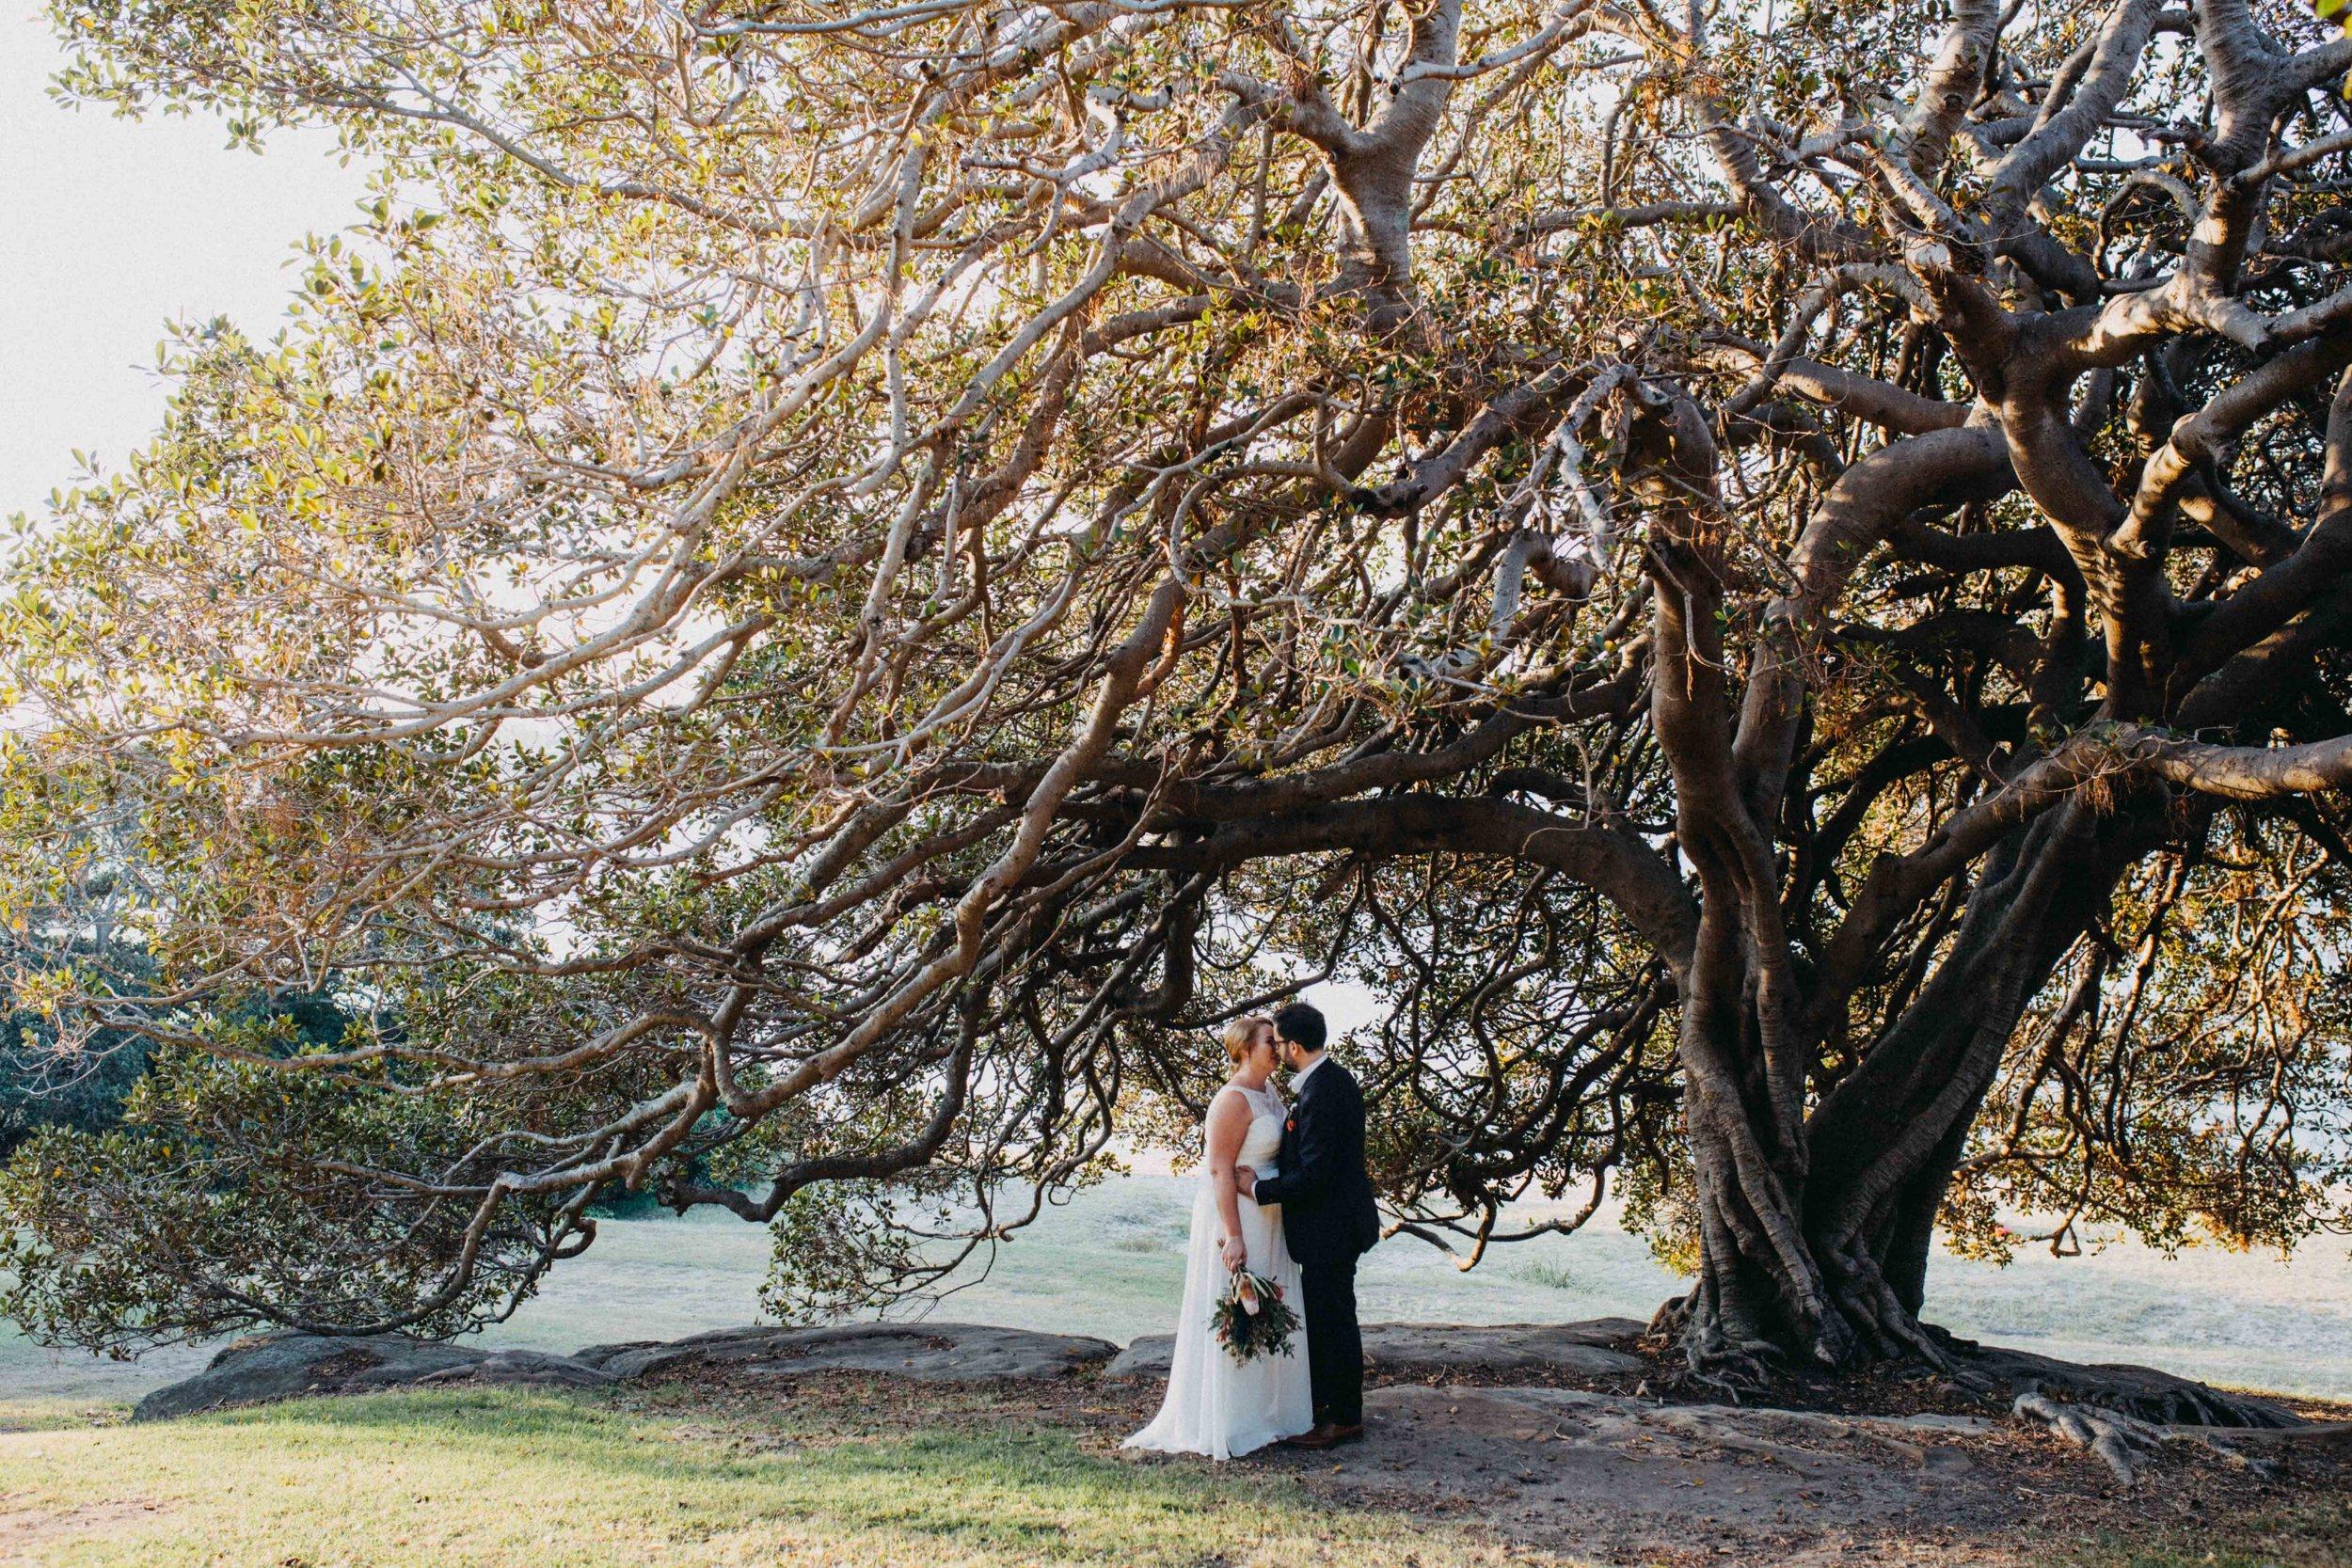 cabarita-park-sydney-wedding-emilyobrienphotography.net-40.jpg